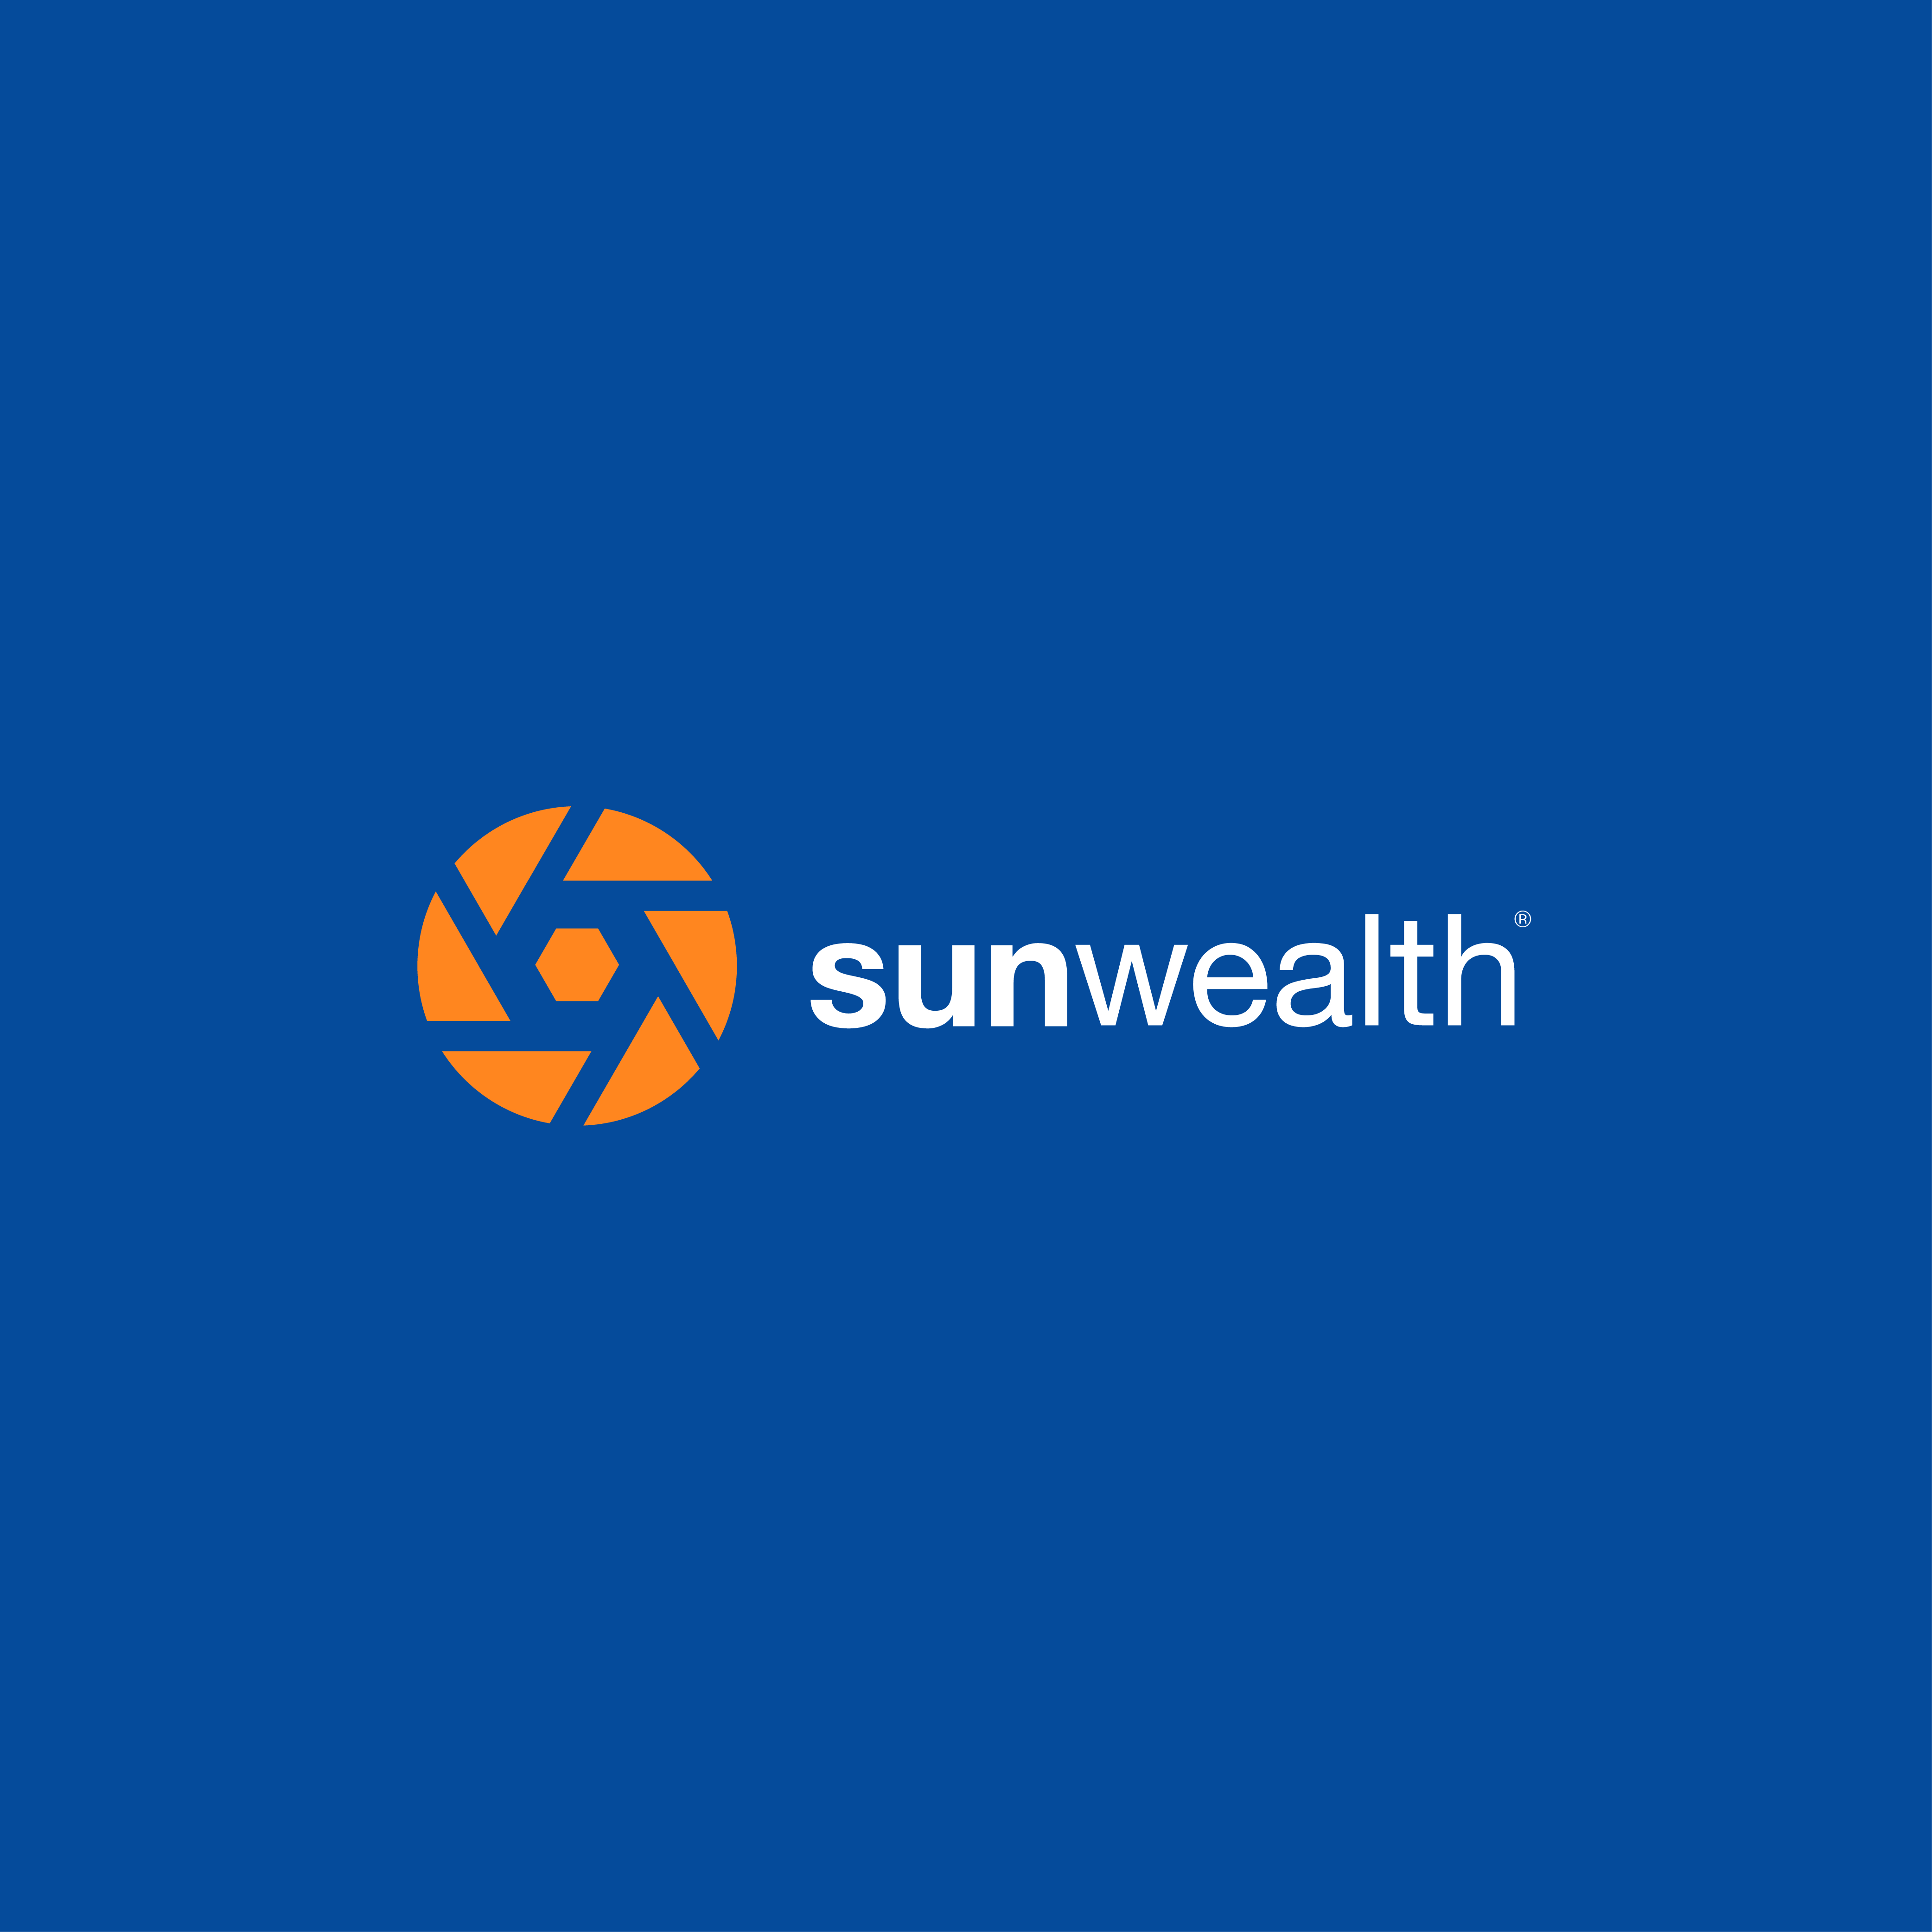 Sunwealth_Blue